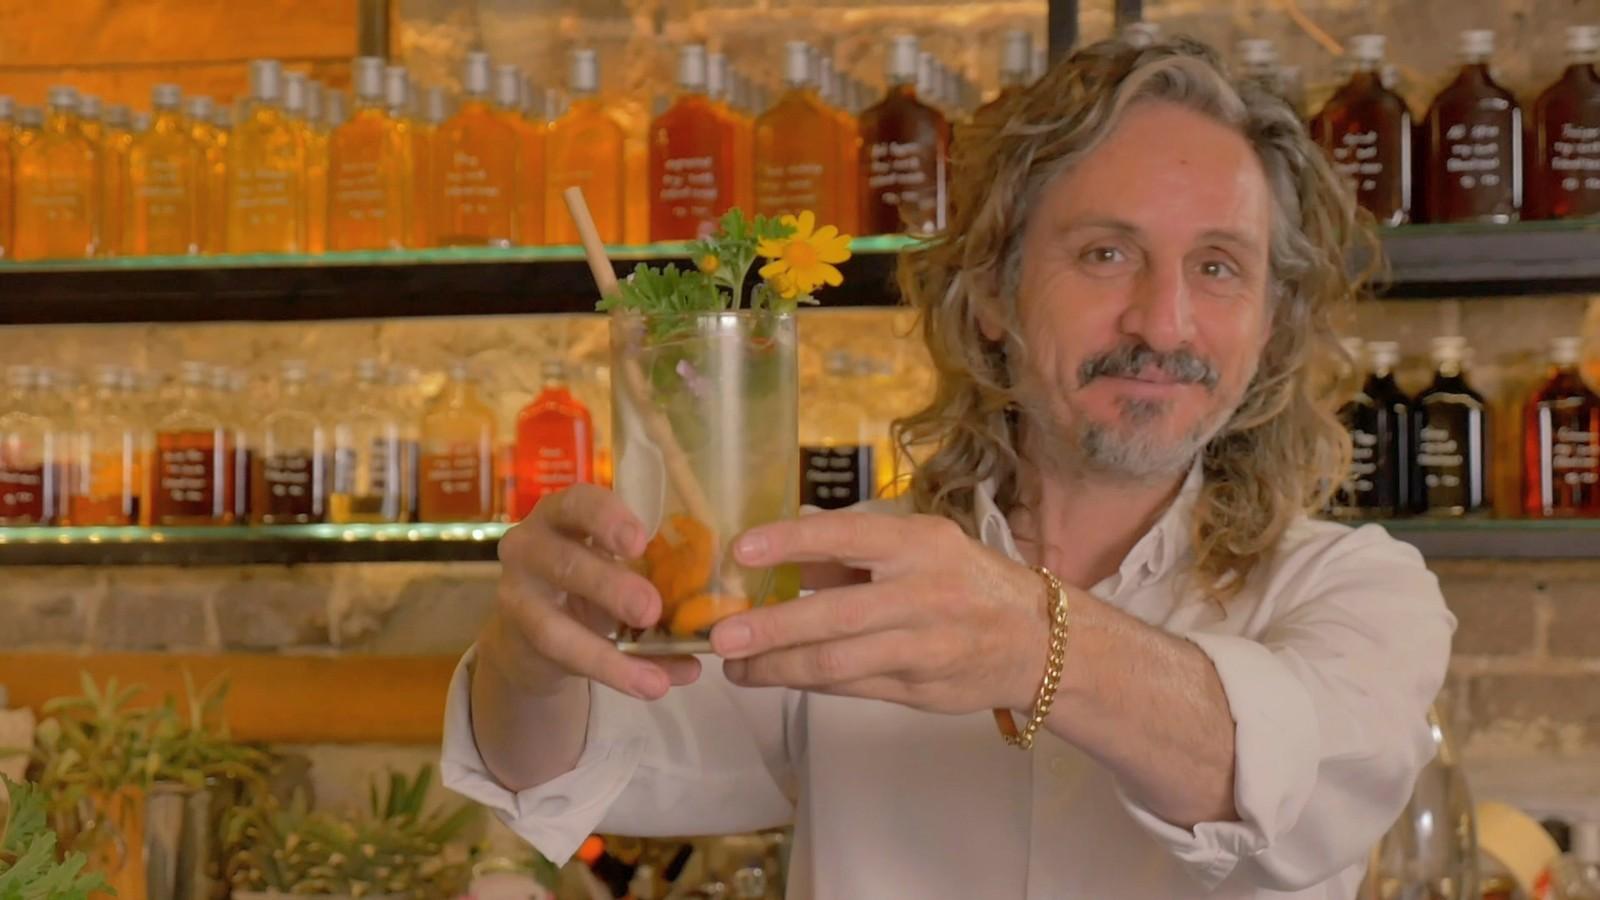 Watch Israel's gazoz master create refreshing fizzy drinks